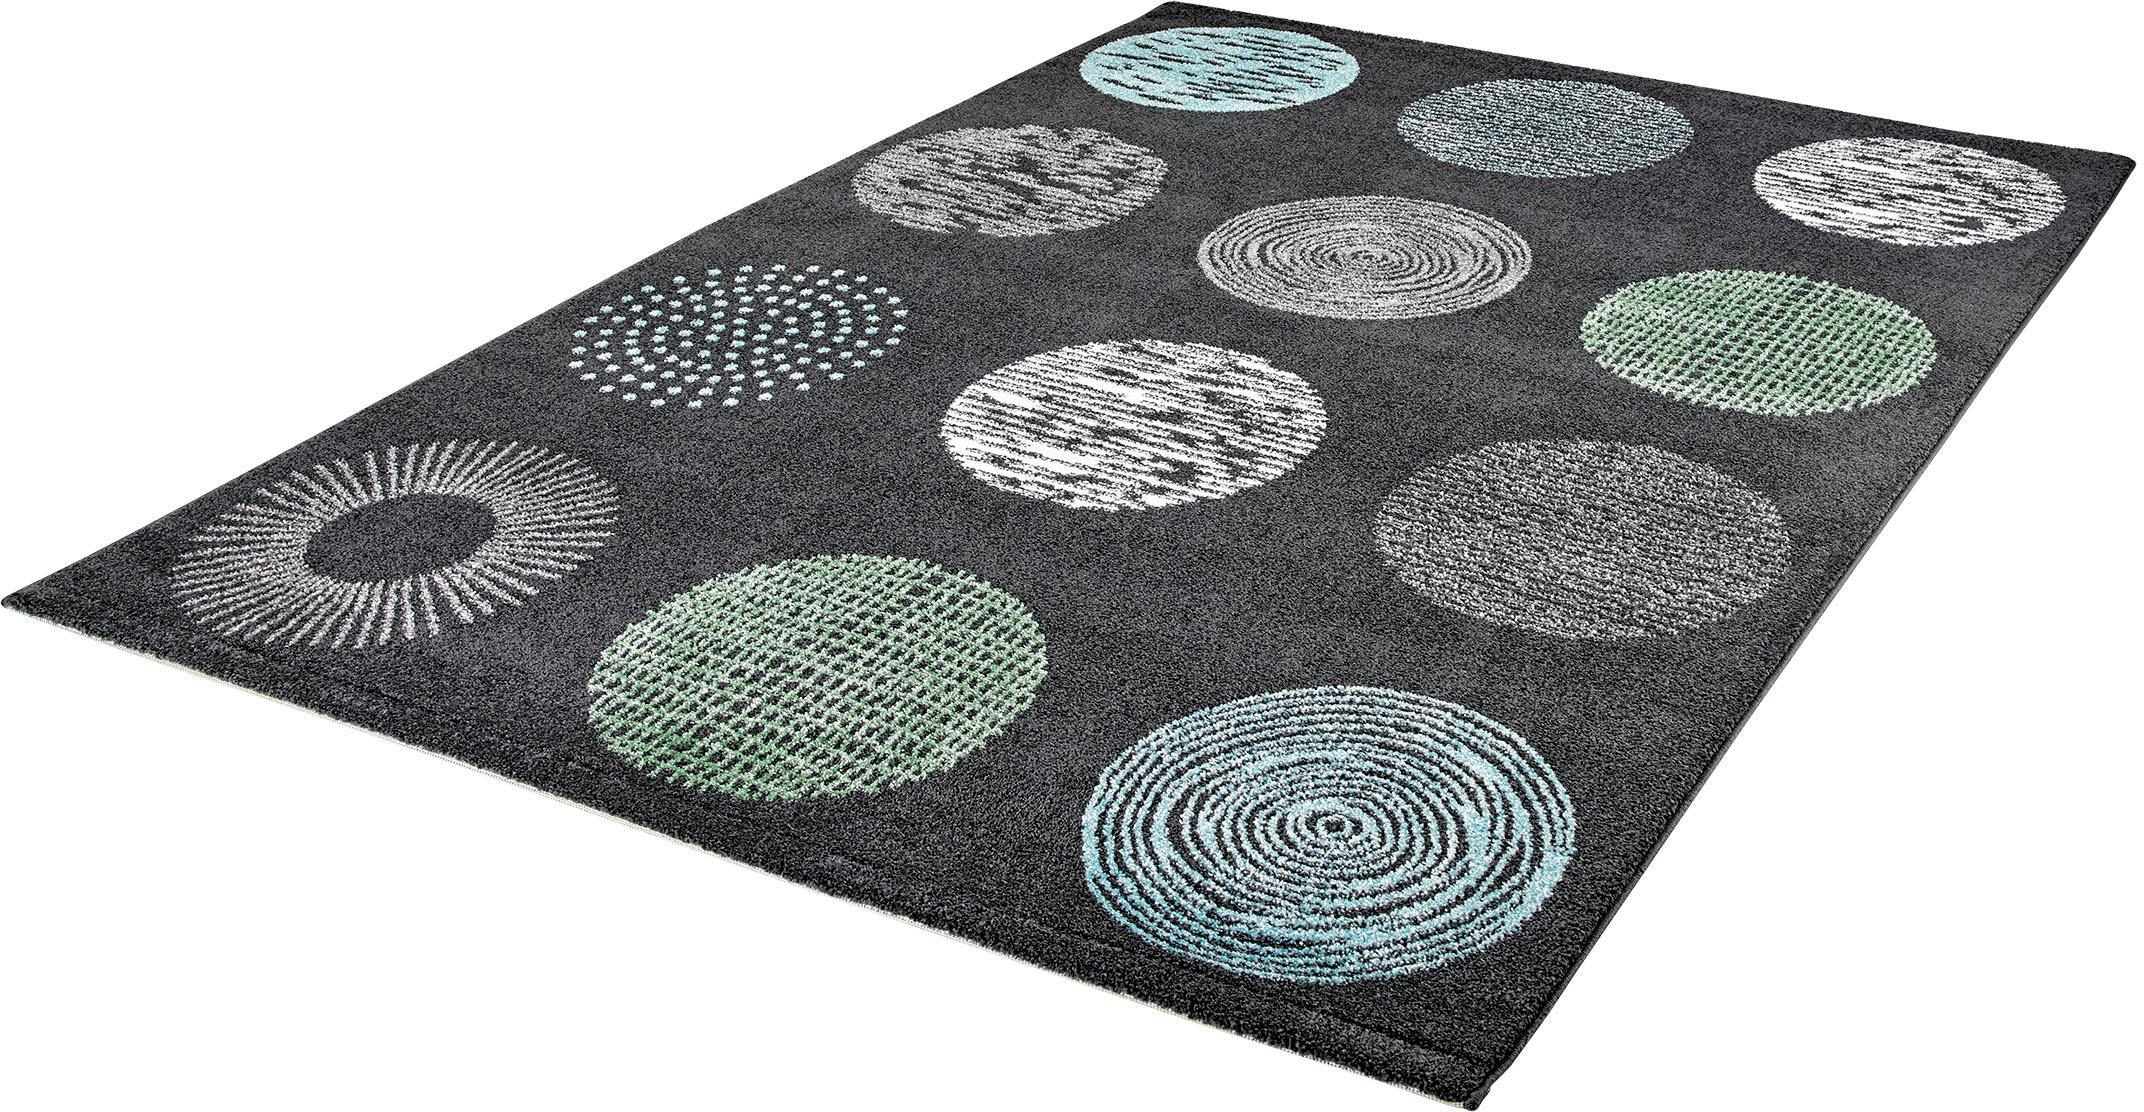 Teppich My Bronx 541 Obsession rechteckig Höhe 18 mm maschinell gewebt